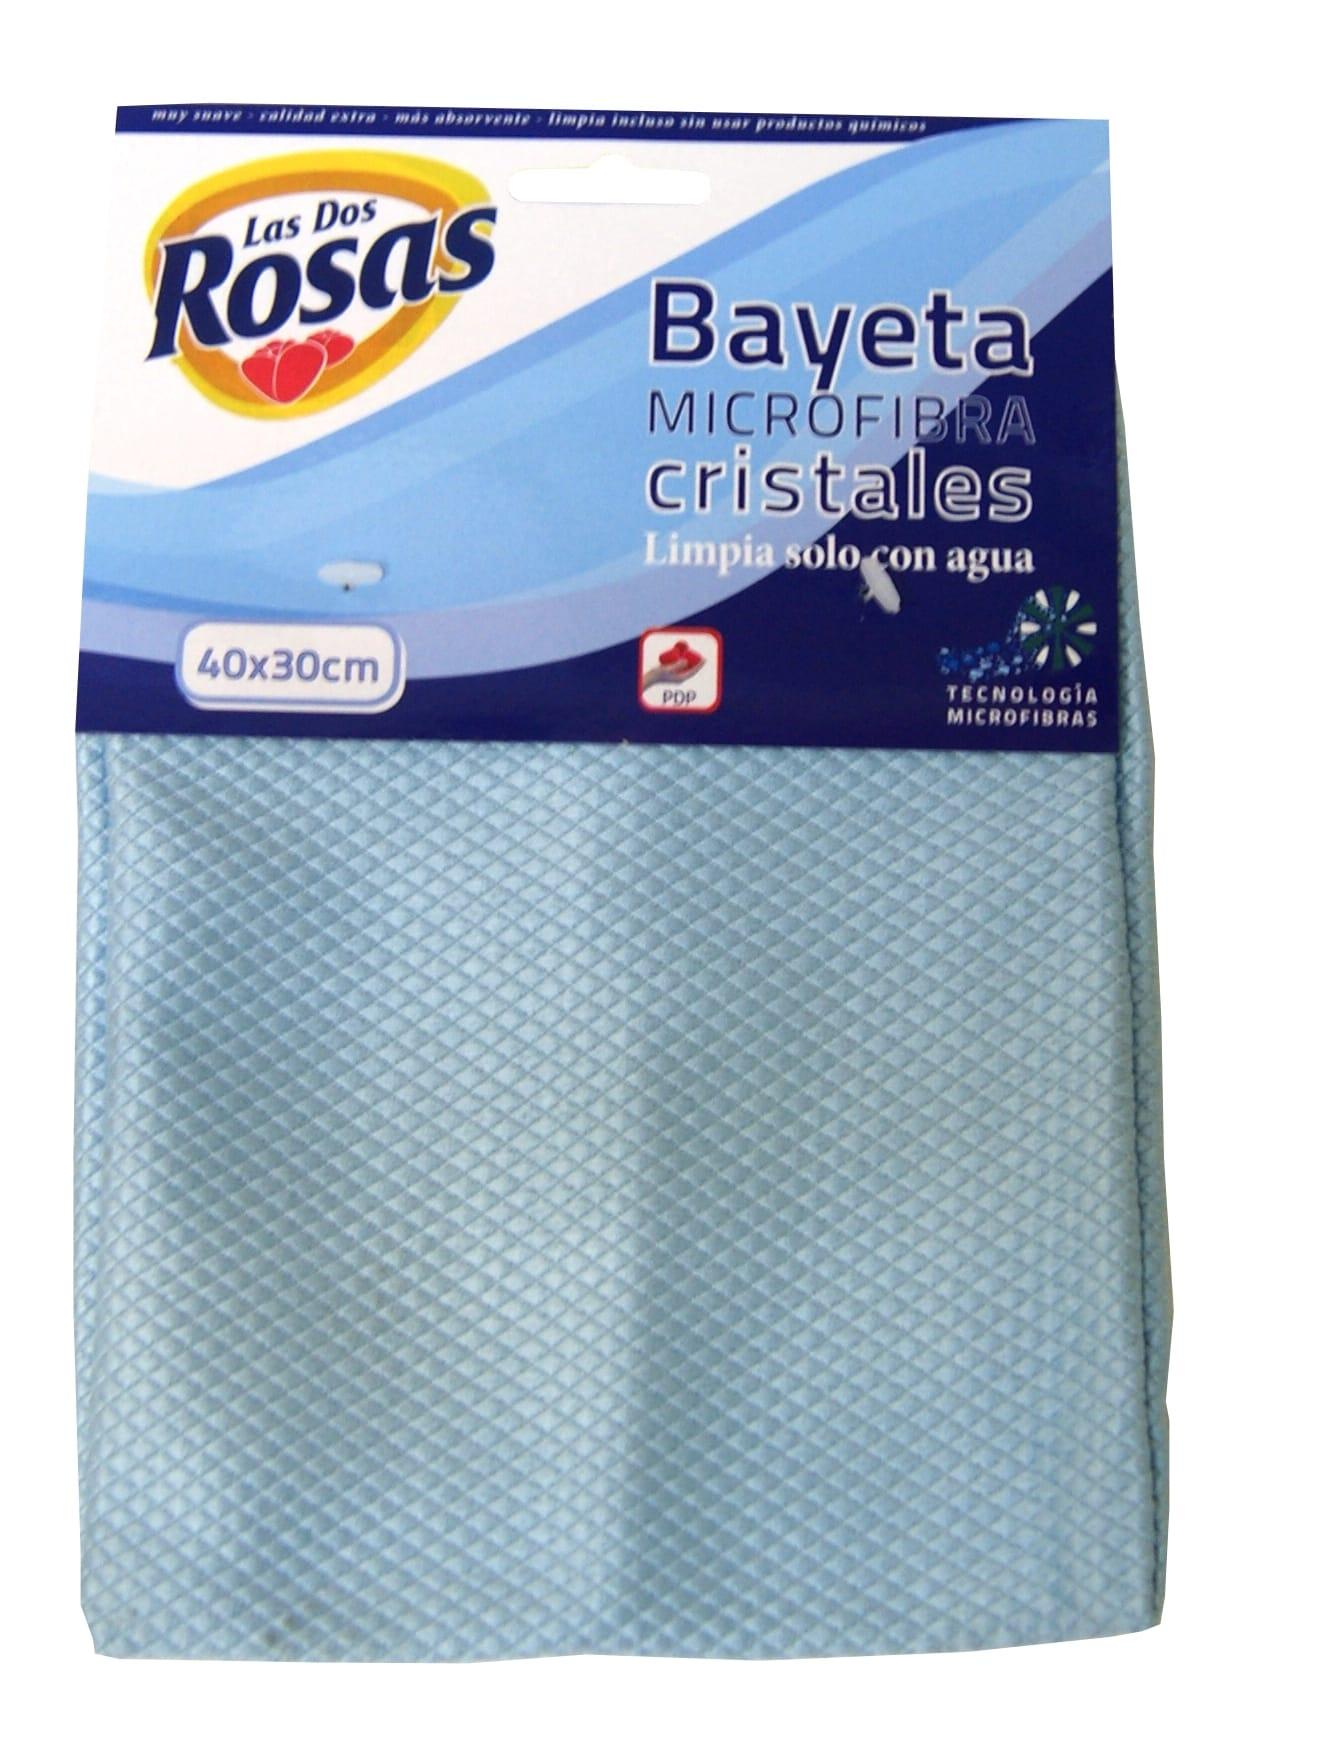 Las 2 Rosas Bayeta Cristales 30x40 cm